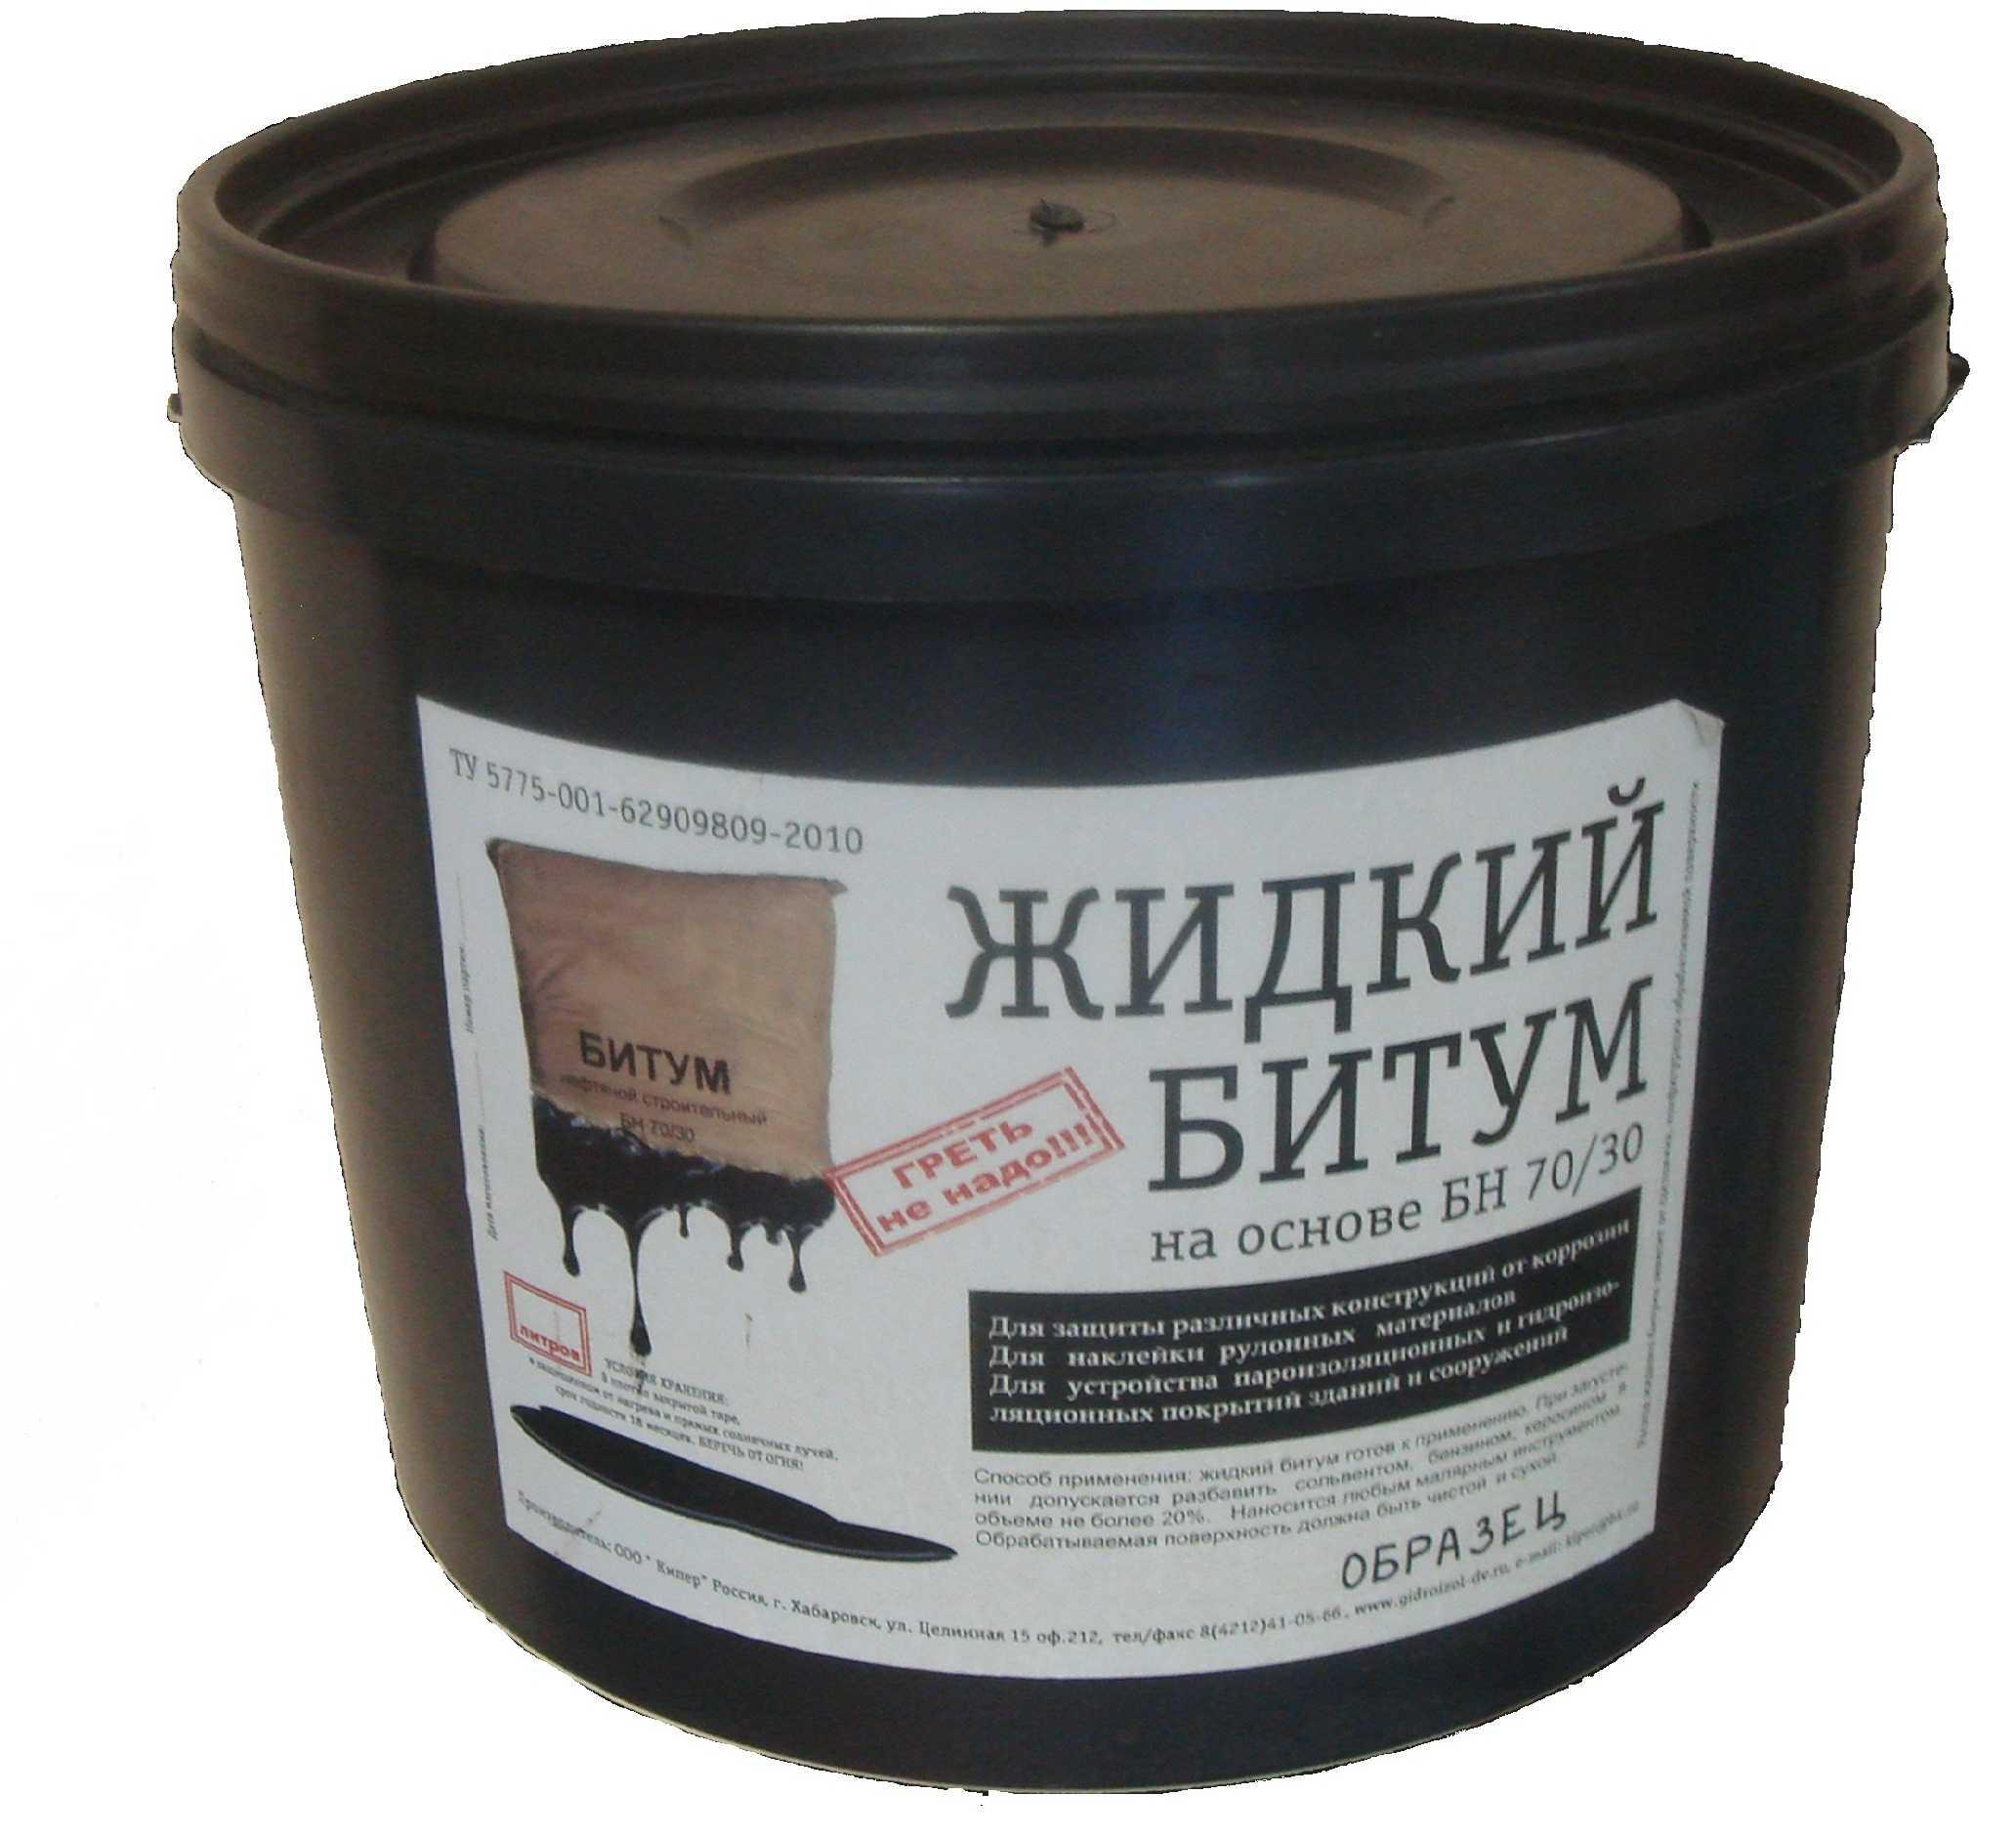 The consumption of bitumen mastic per 1 m2 of waterproofing